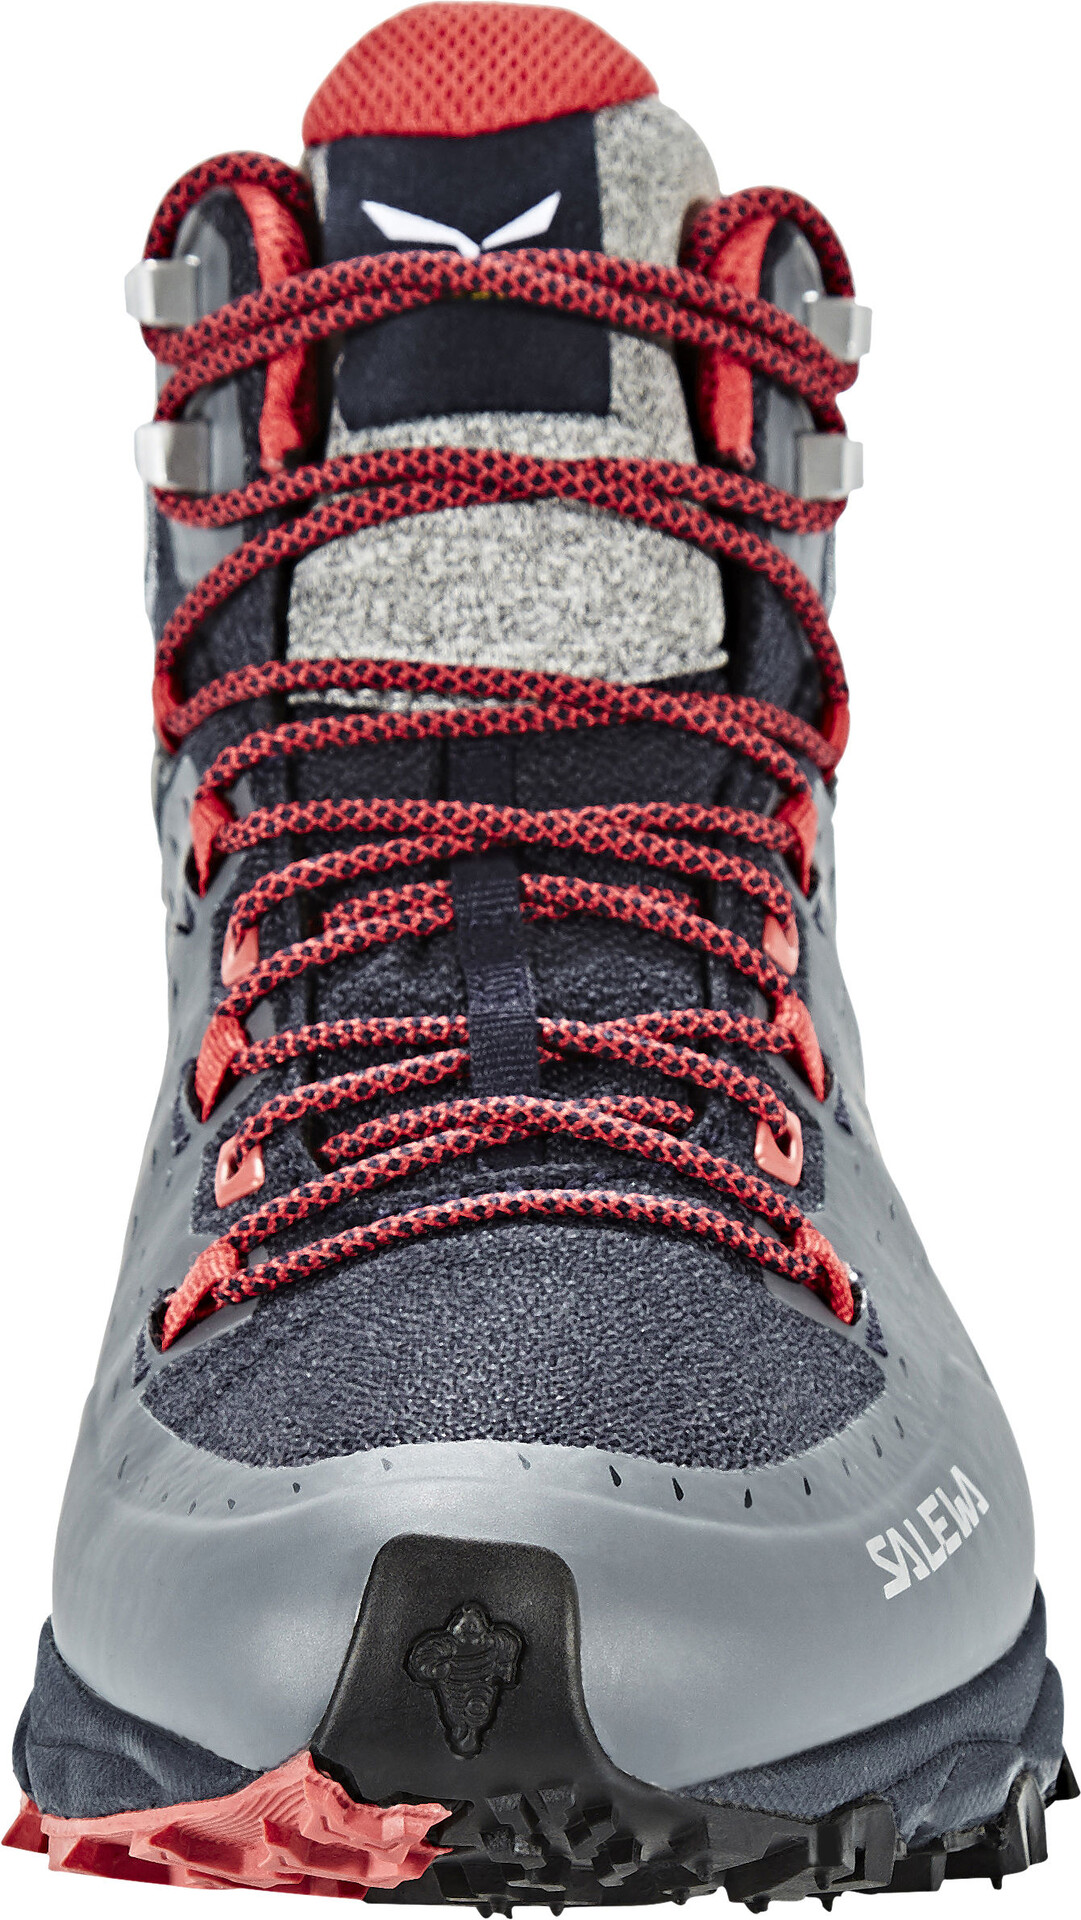 SALEWA Alpenrose Ultra Mid GTX Shoes Damen night blackmineral red